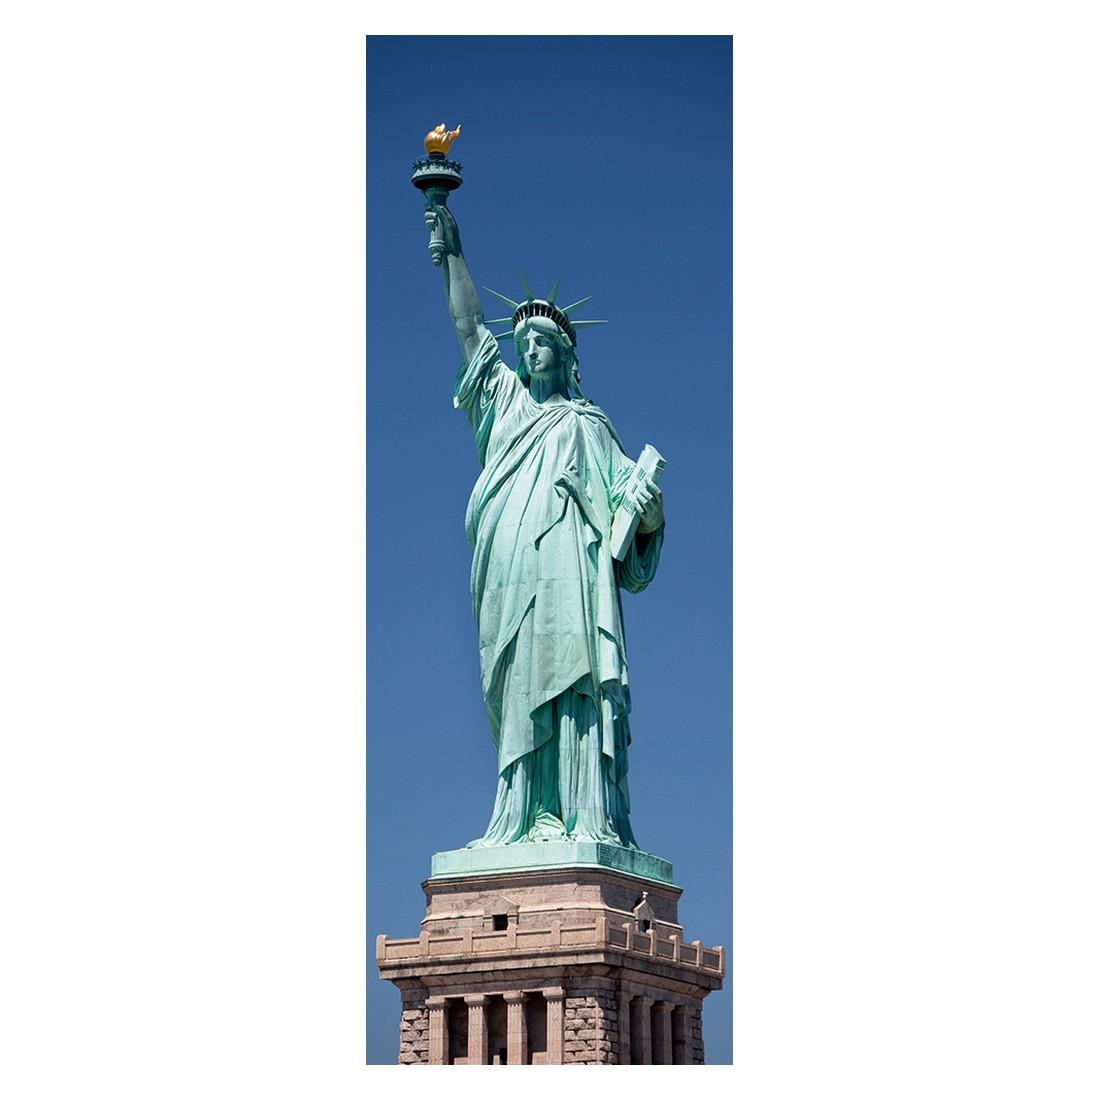 Decopanel Statue of Liberty – blau, grau, grün – glatt, Architects Paper günstig kaufen